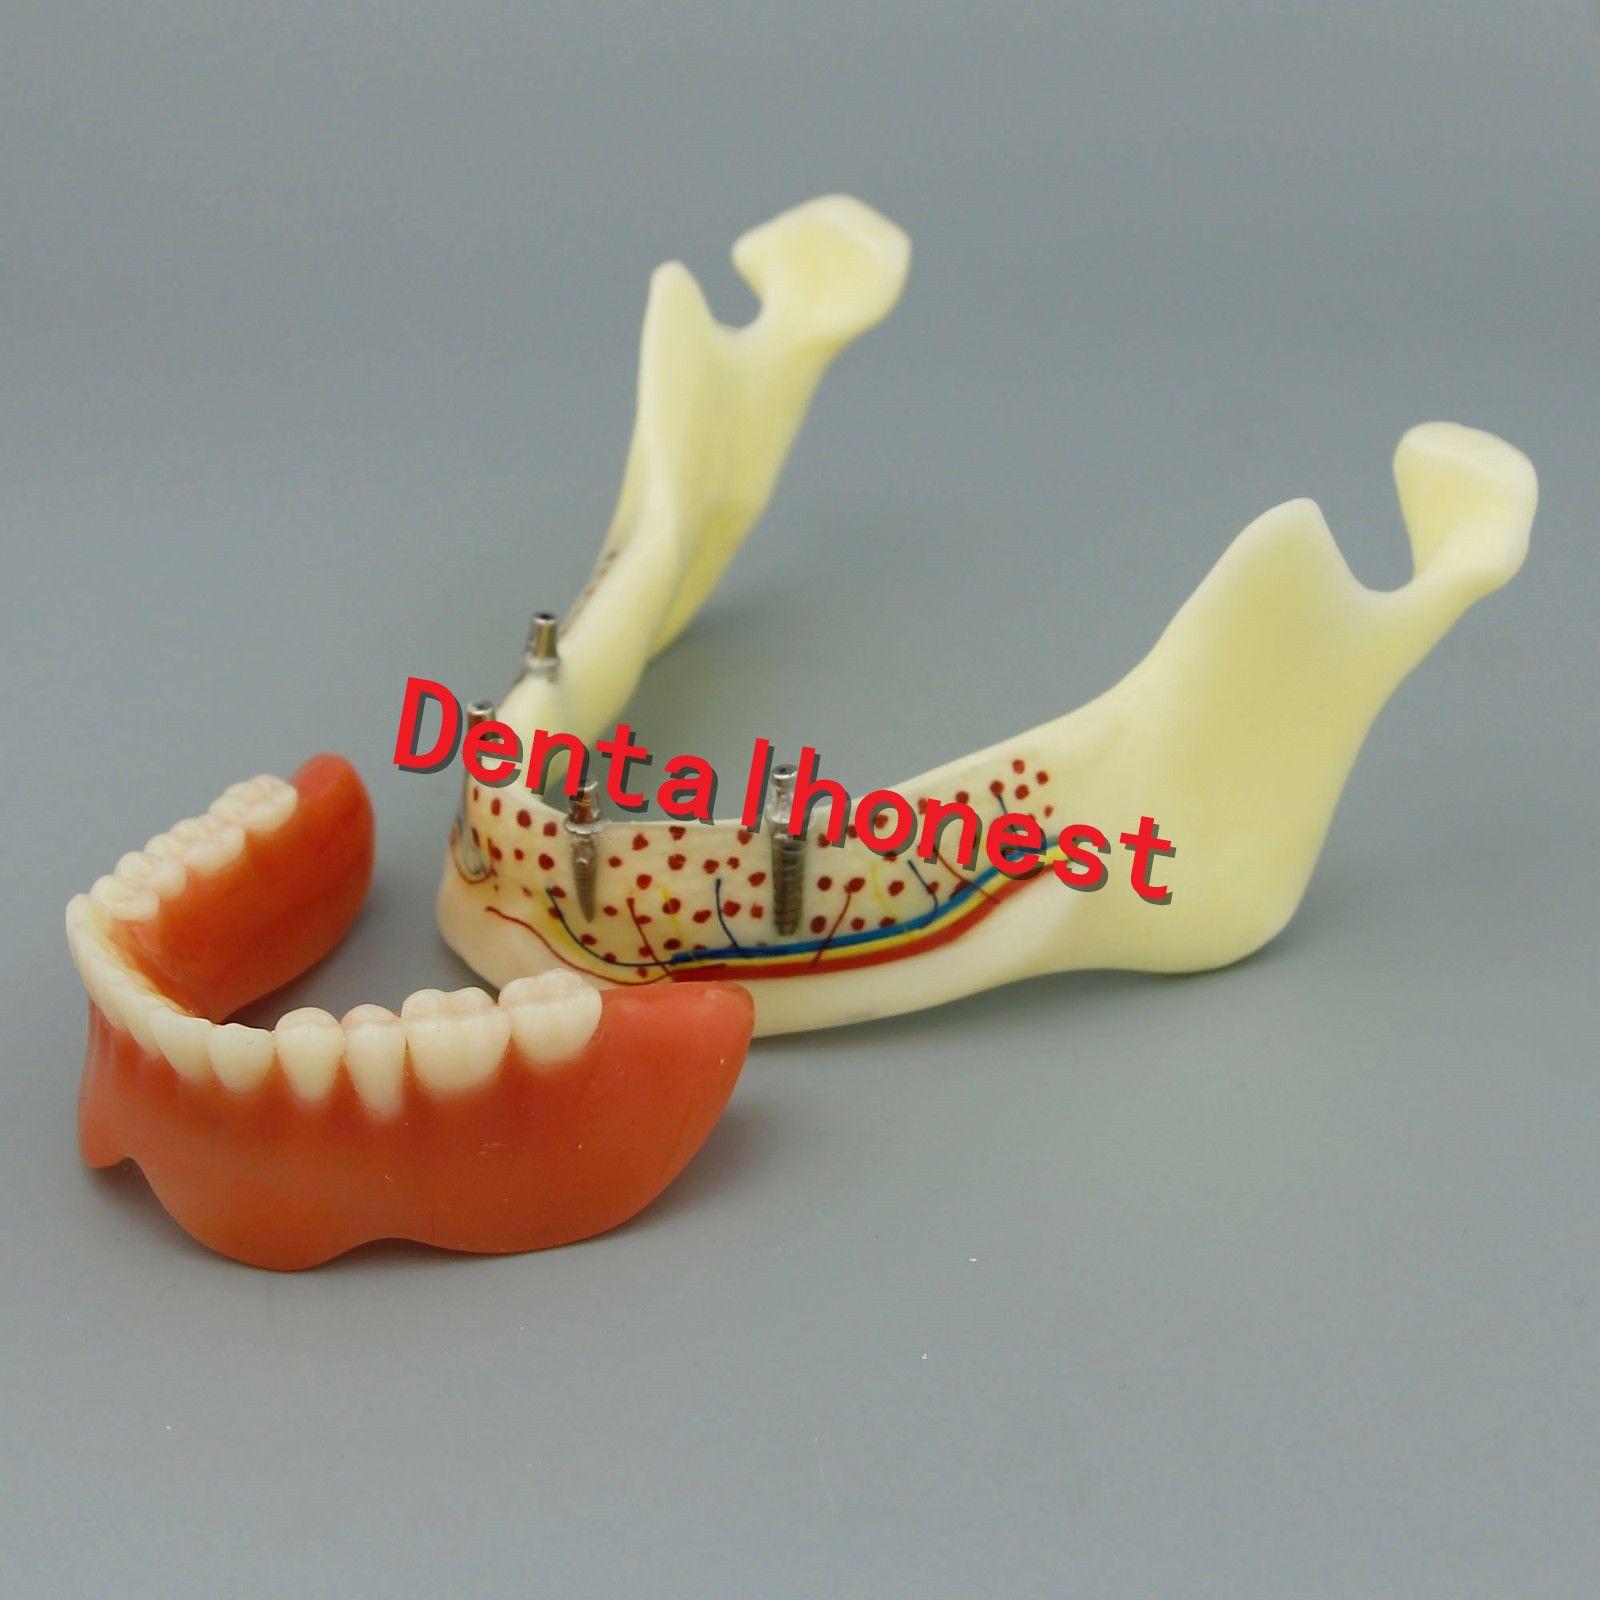 Dental Mandible Implant Overdenture Teeth Model with vessels Demo Model 2014 teeth model blue dental orthodontics communication model with 4 types of brackets